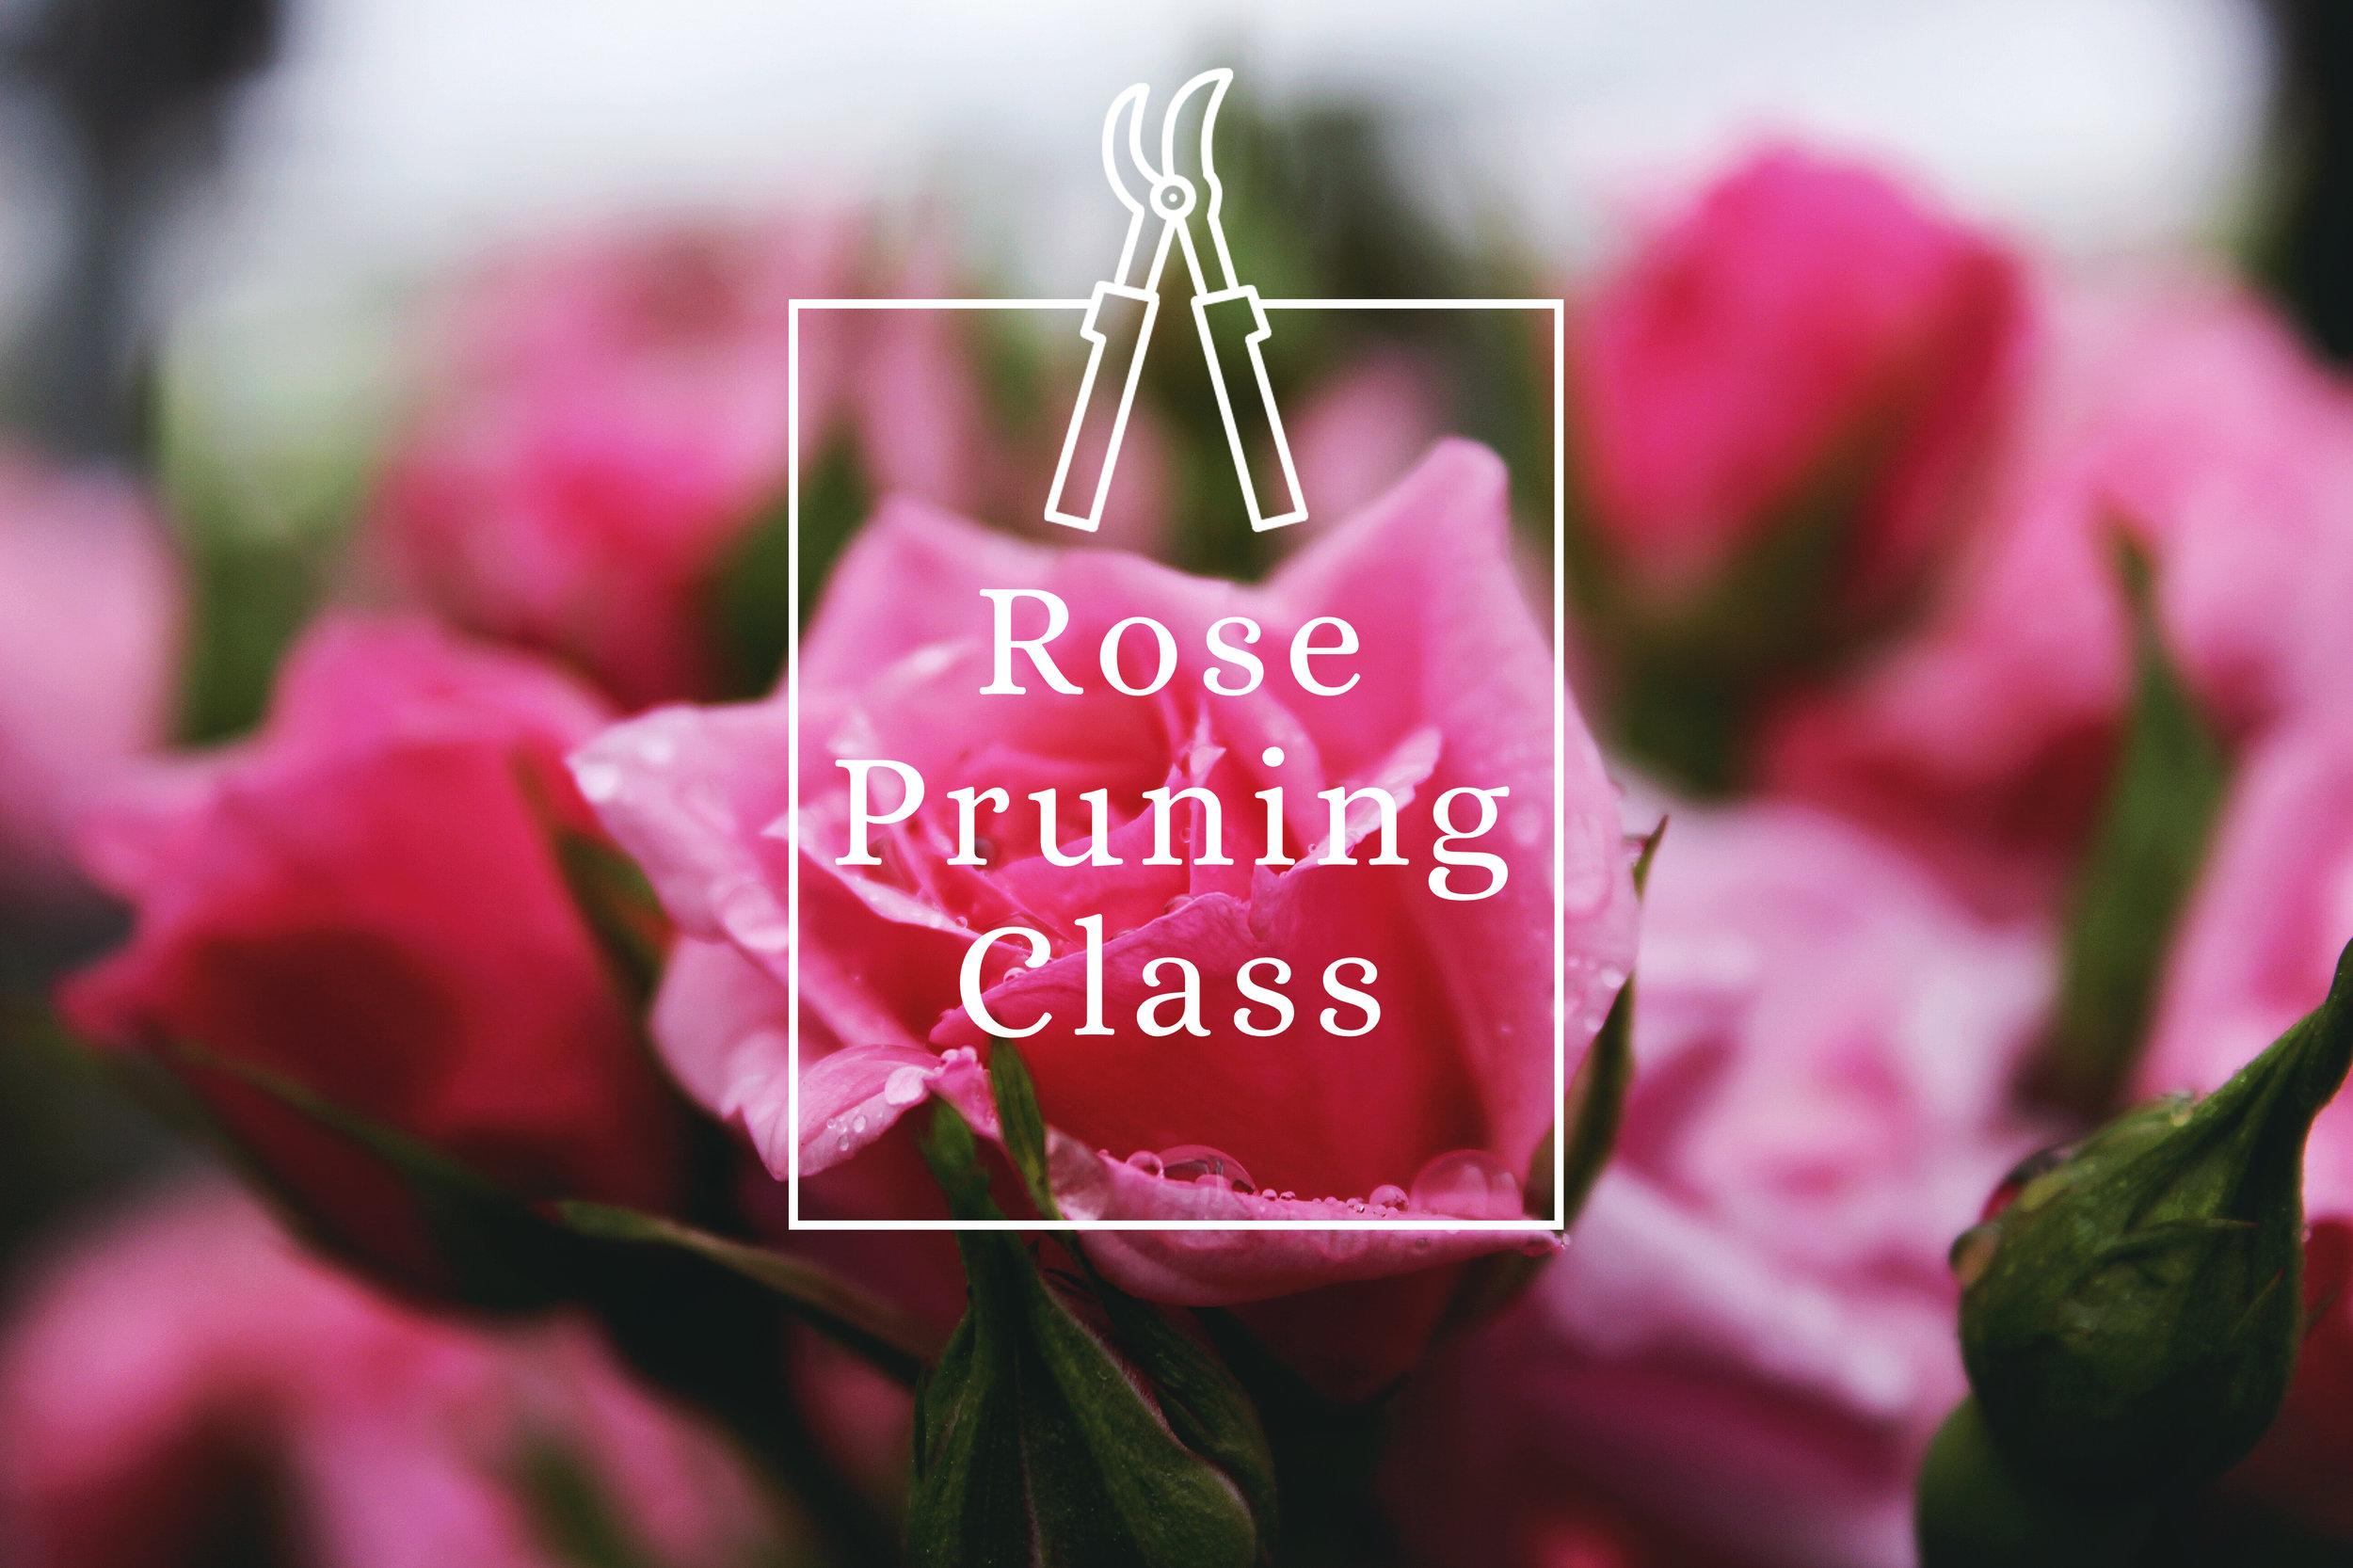 rose pruning class.jpg